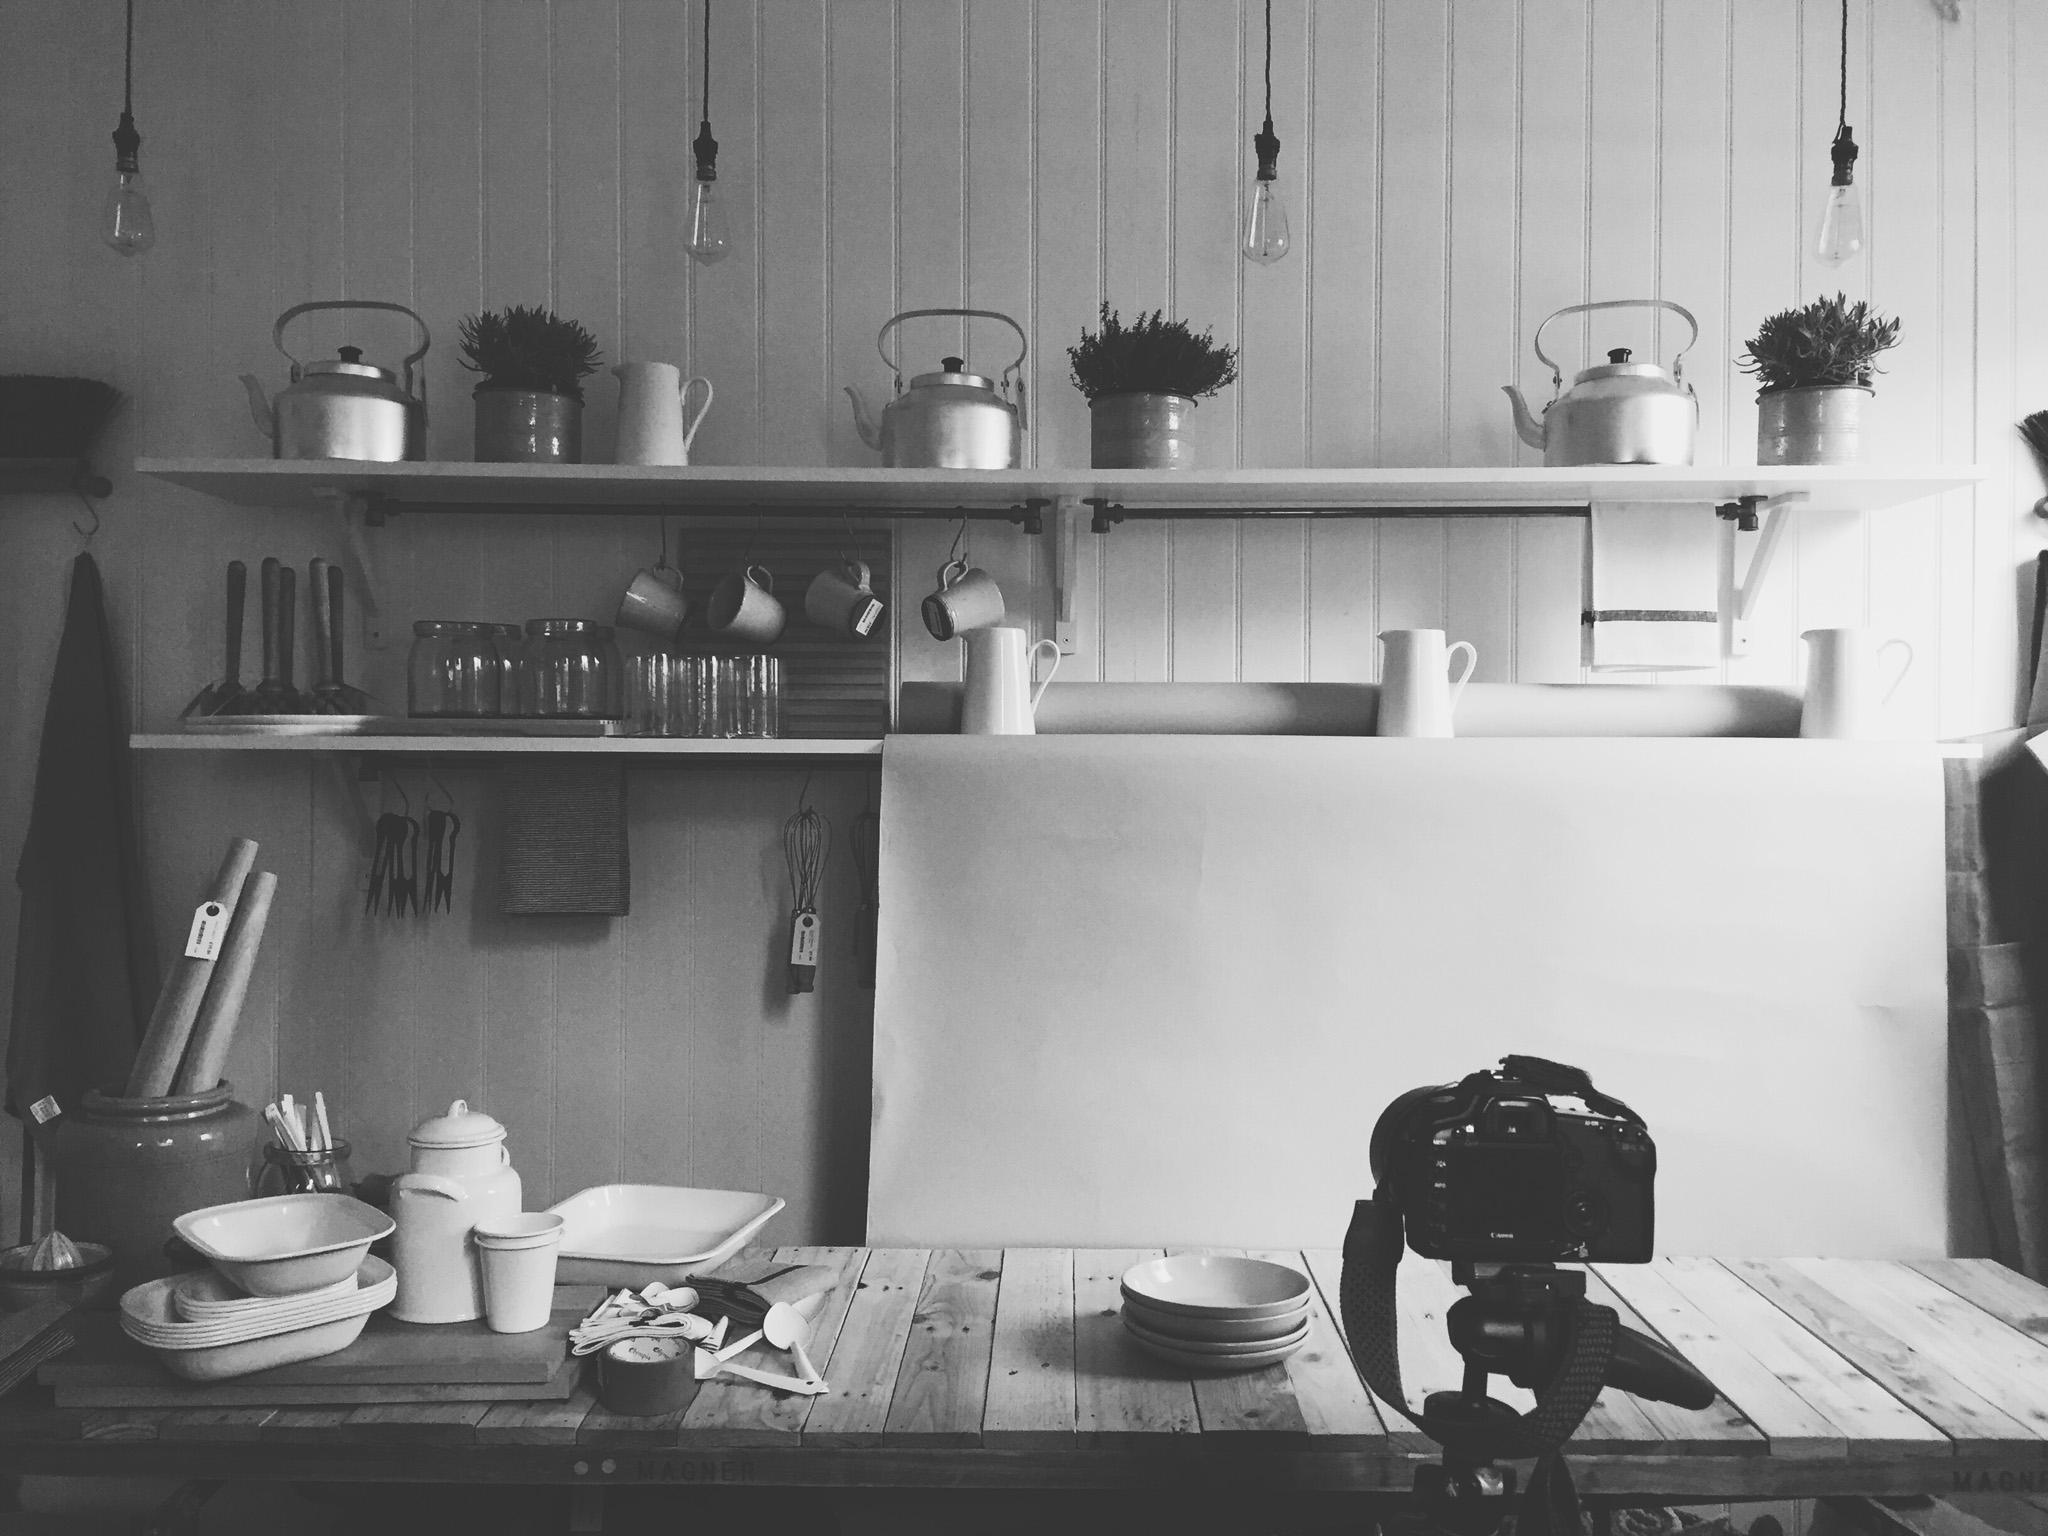 Week of Instagram. Retreat // a Sussex food & Lifestyle blog.